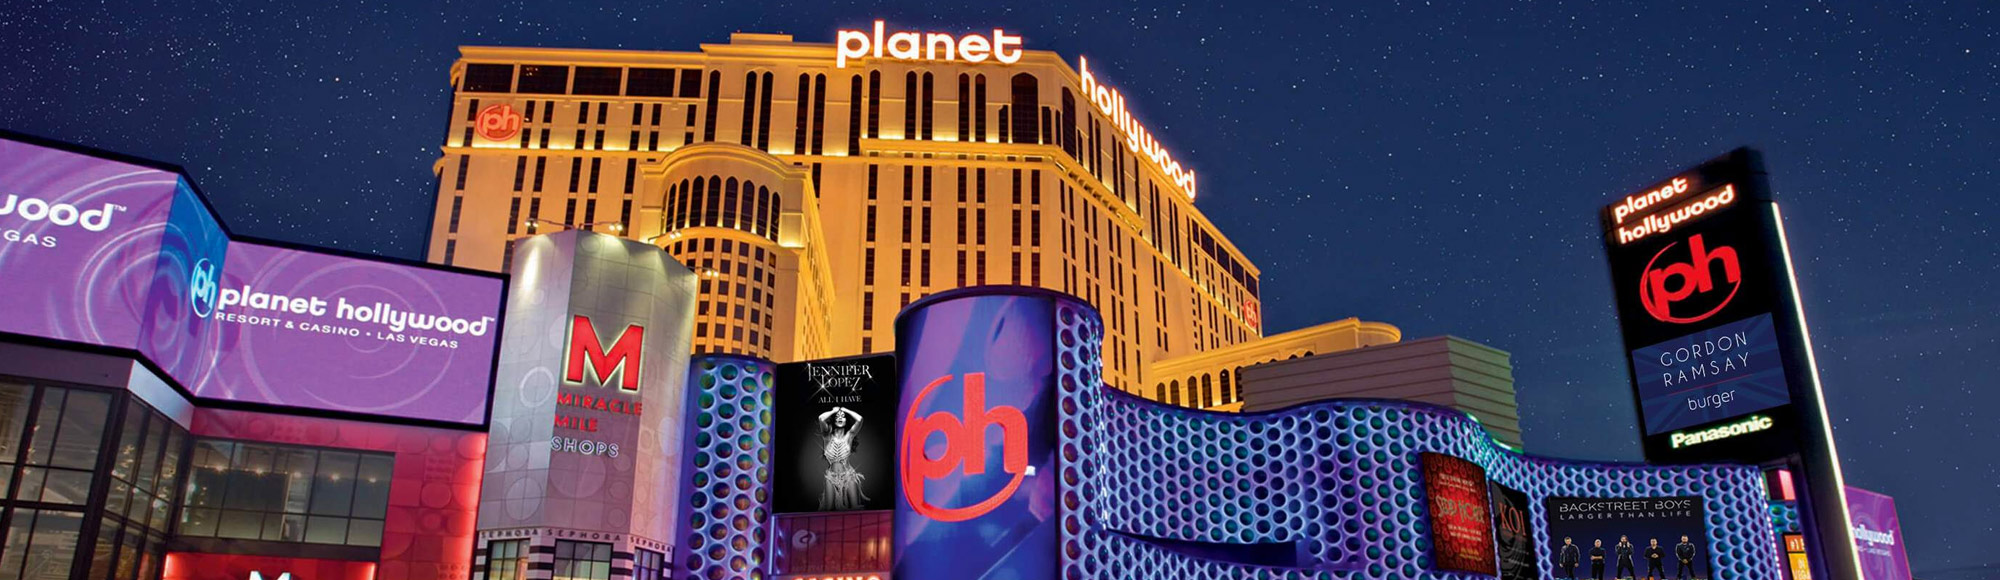 Planet Hollywood Hotel in Las Vegas | Vegas com